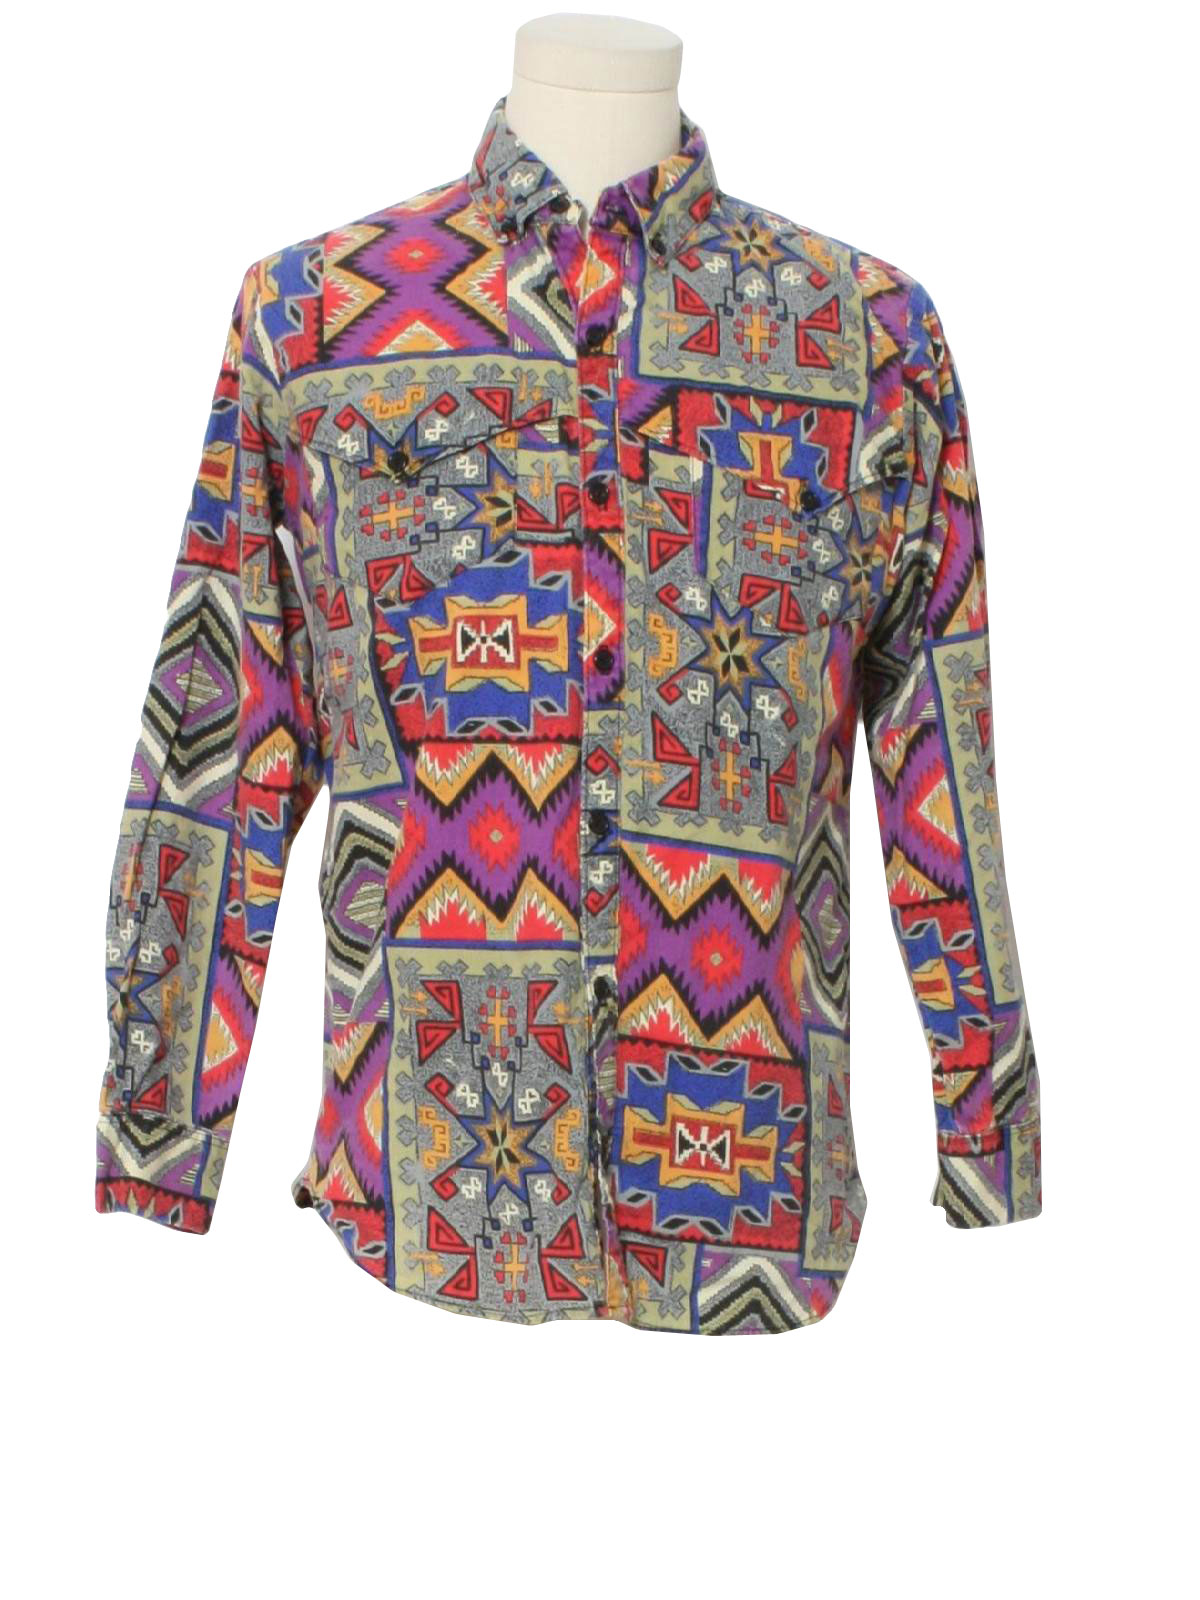 90s Pattern Shirts Cool Decorating